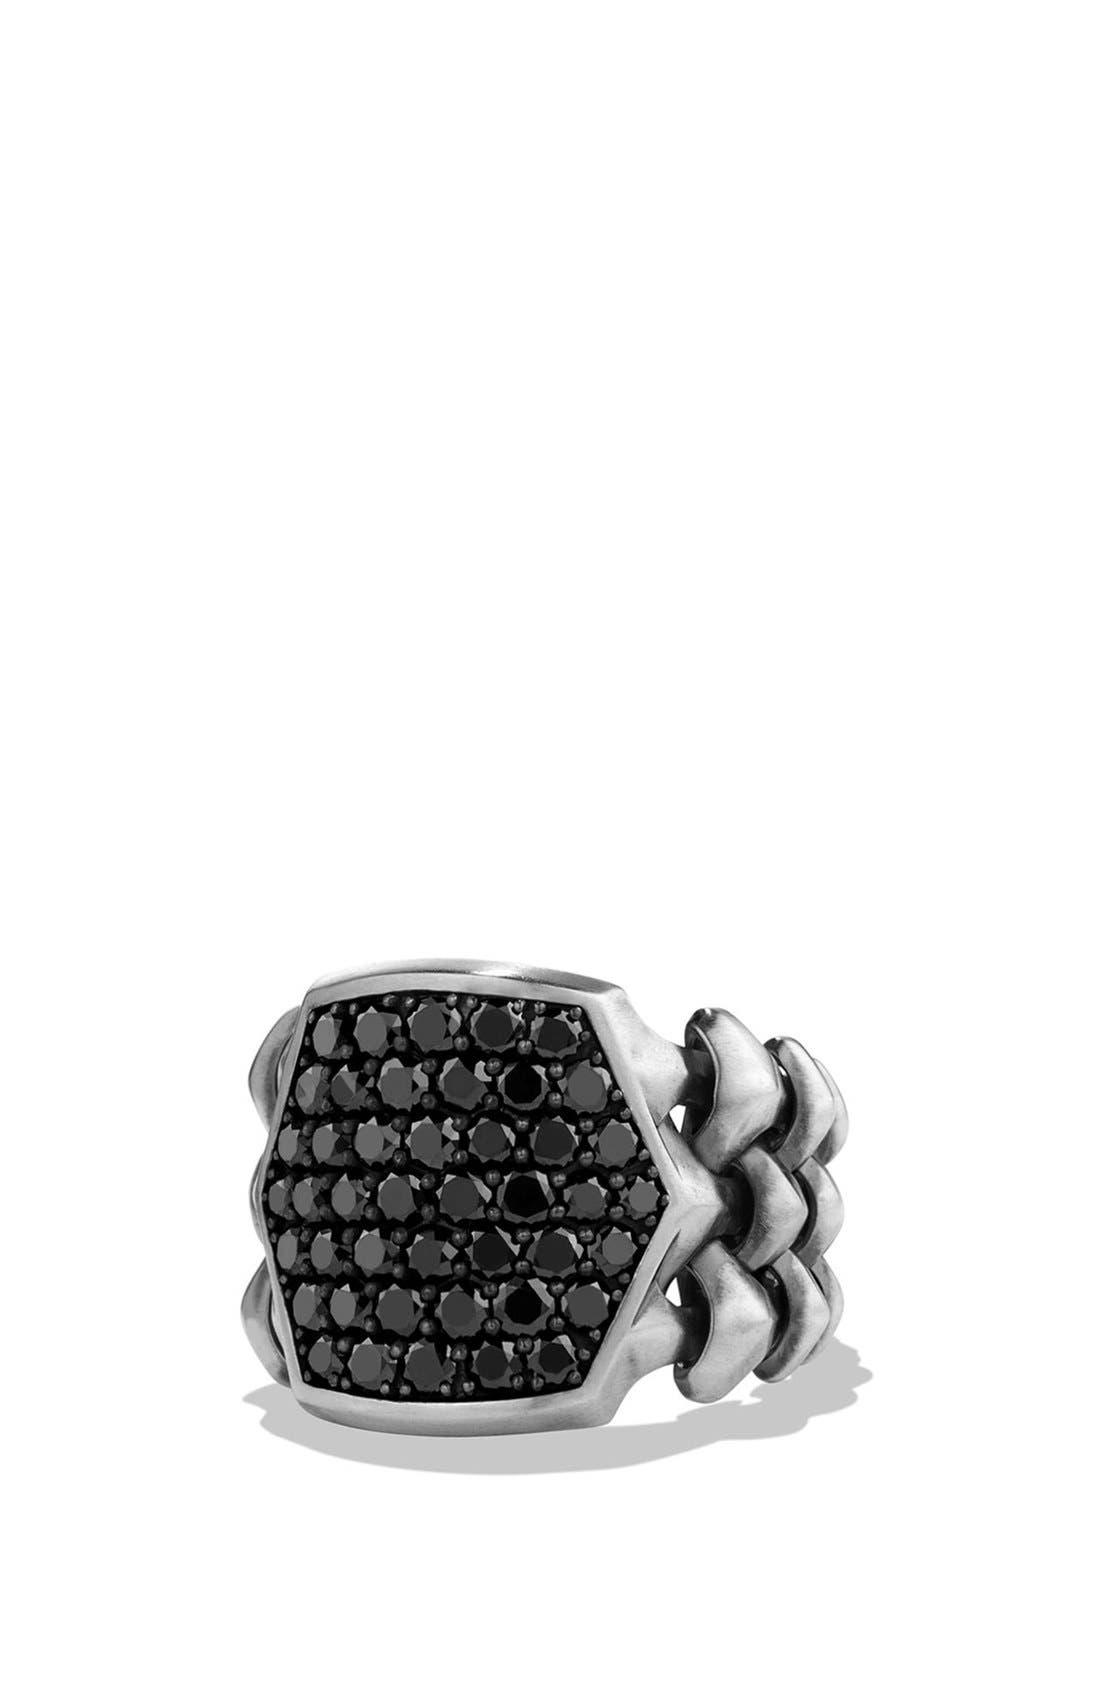 David Yurman 'Armory' Signet Ring with Black Diamonds